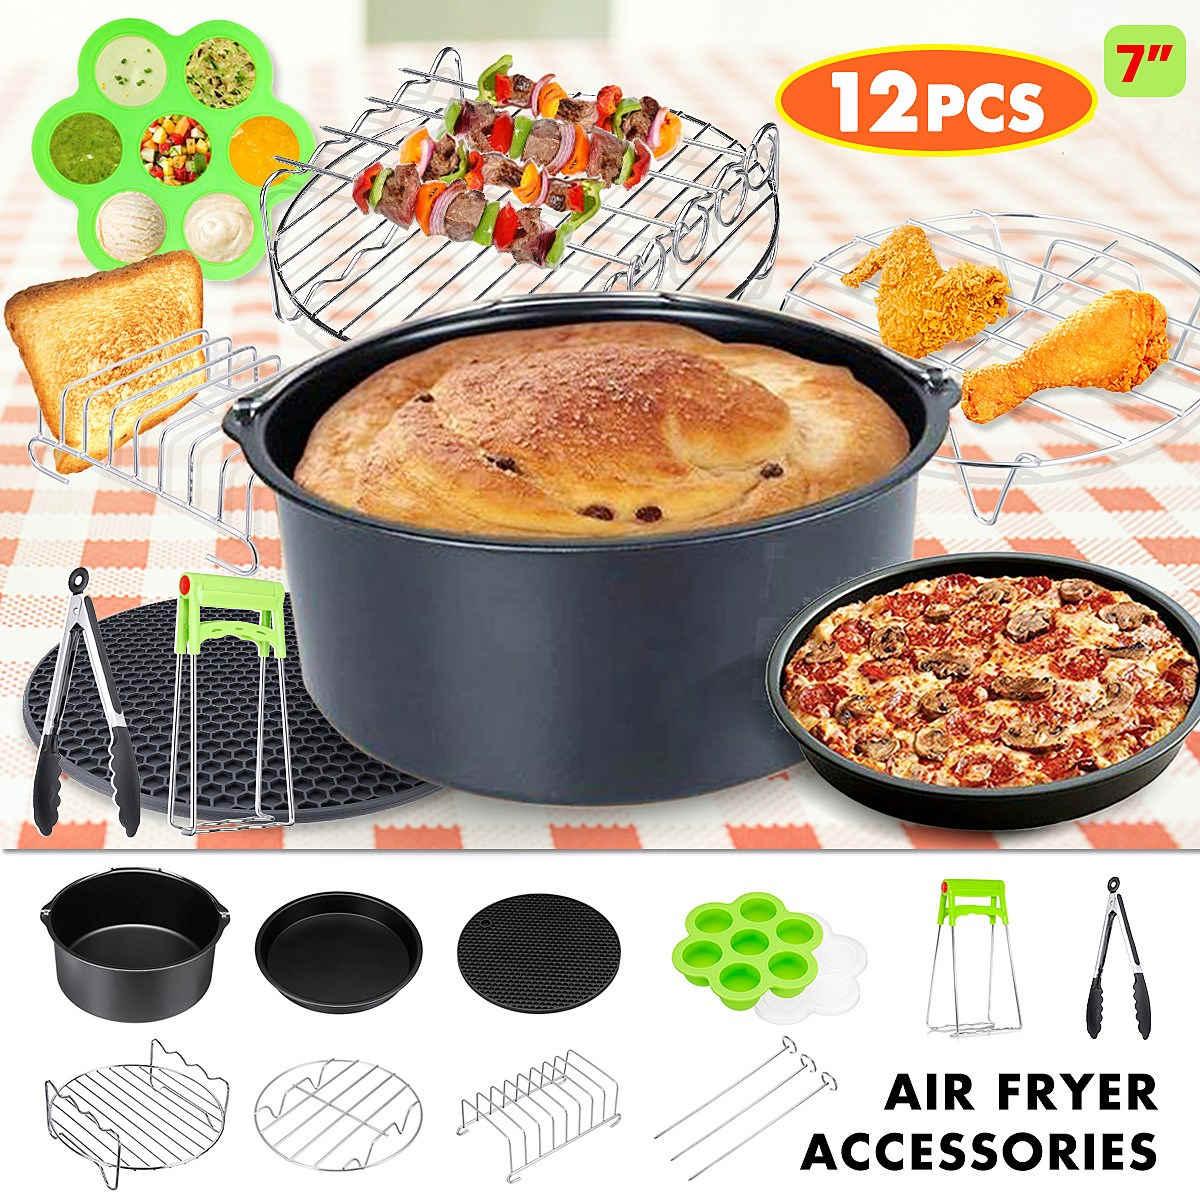 12 Uds accesorios para freidora de aire 7 pulgadas olla de freir al aire freidora pastel barril Rack Pizza Pan plato placa Clip para 3,2-6.8QT aire freidora